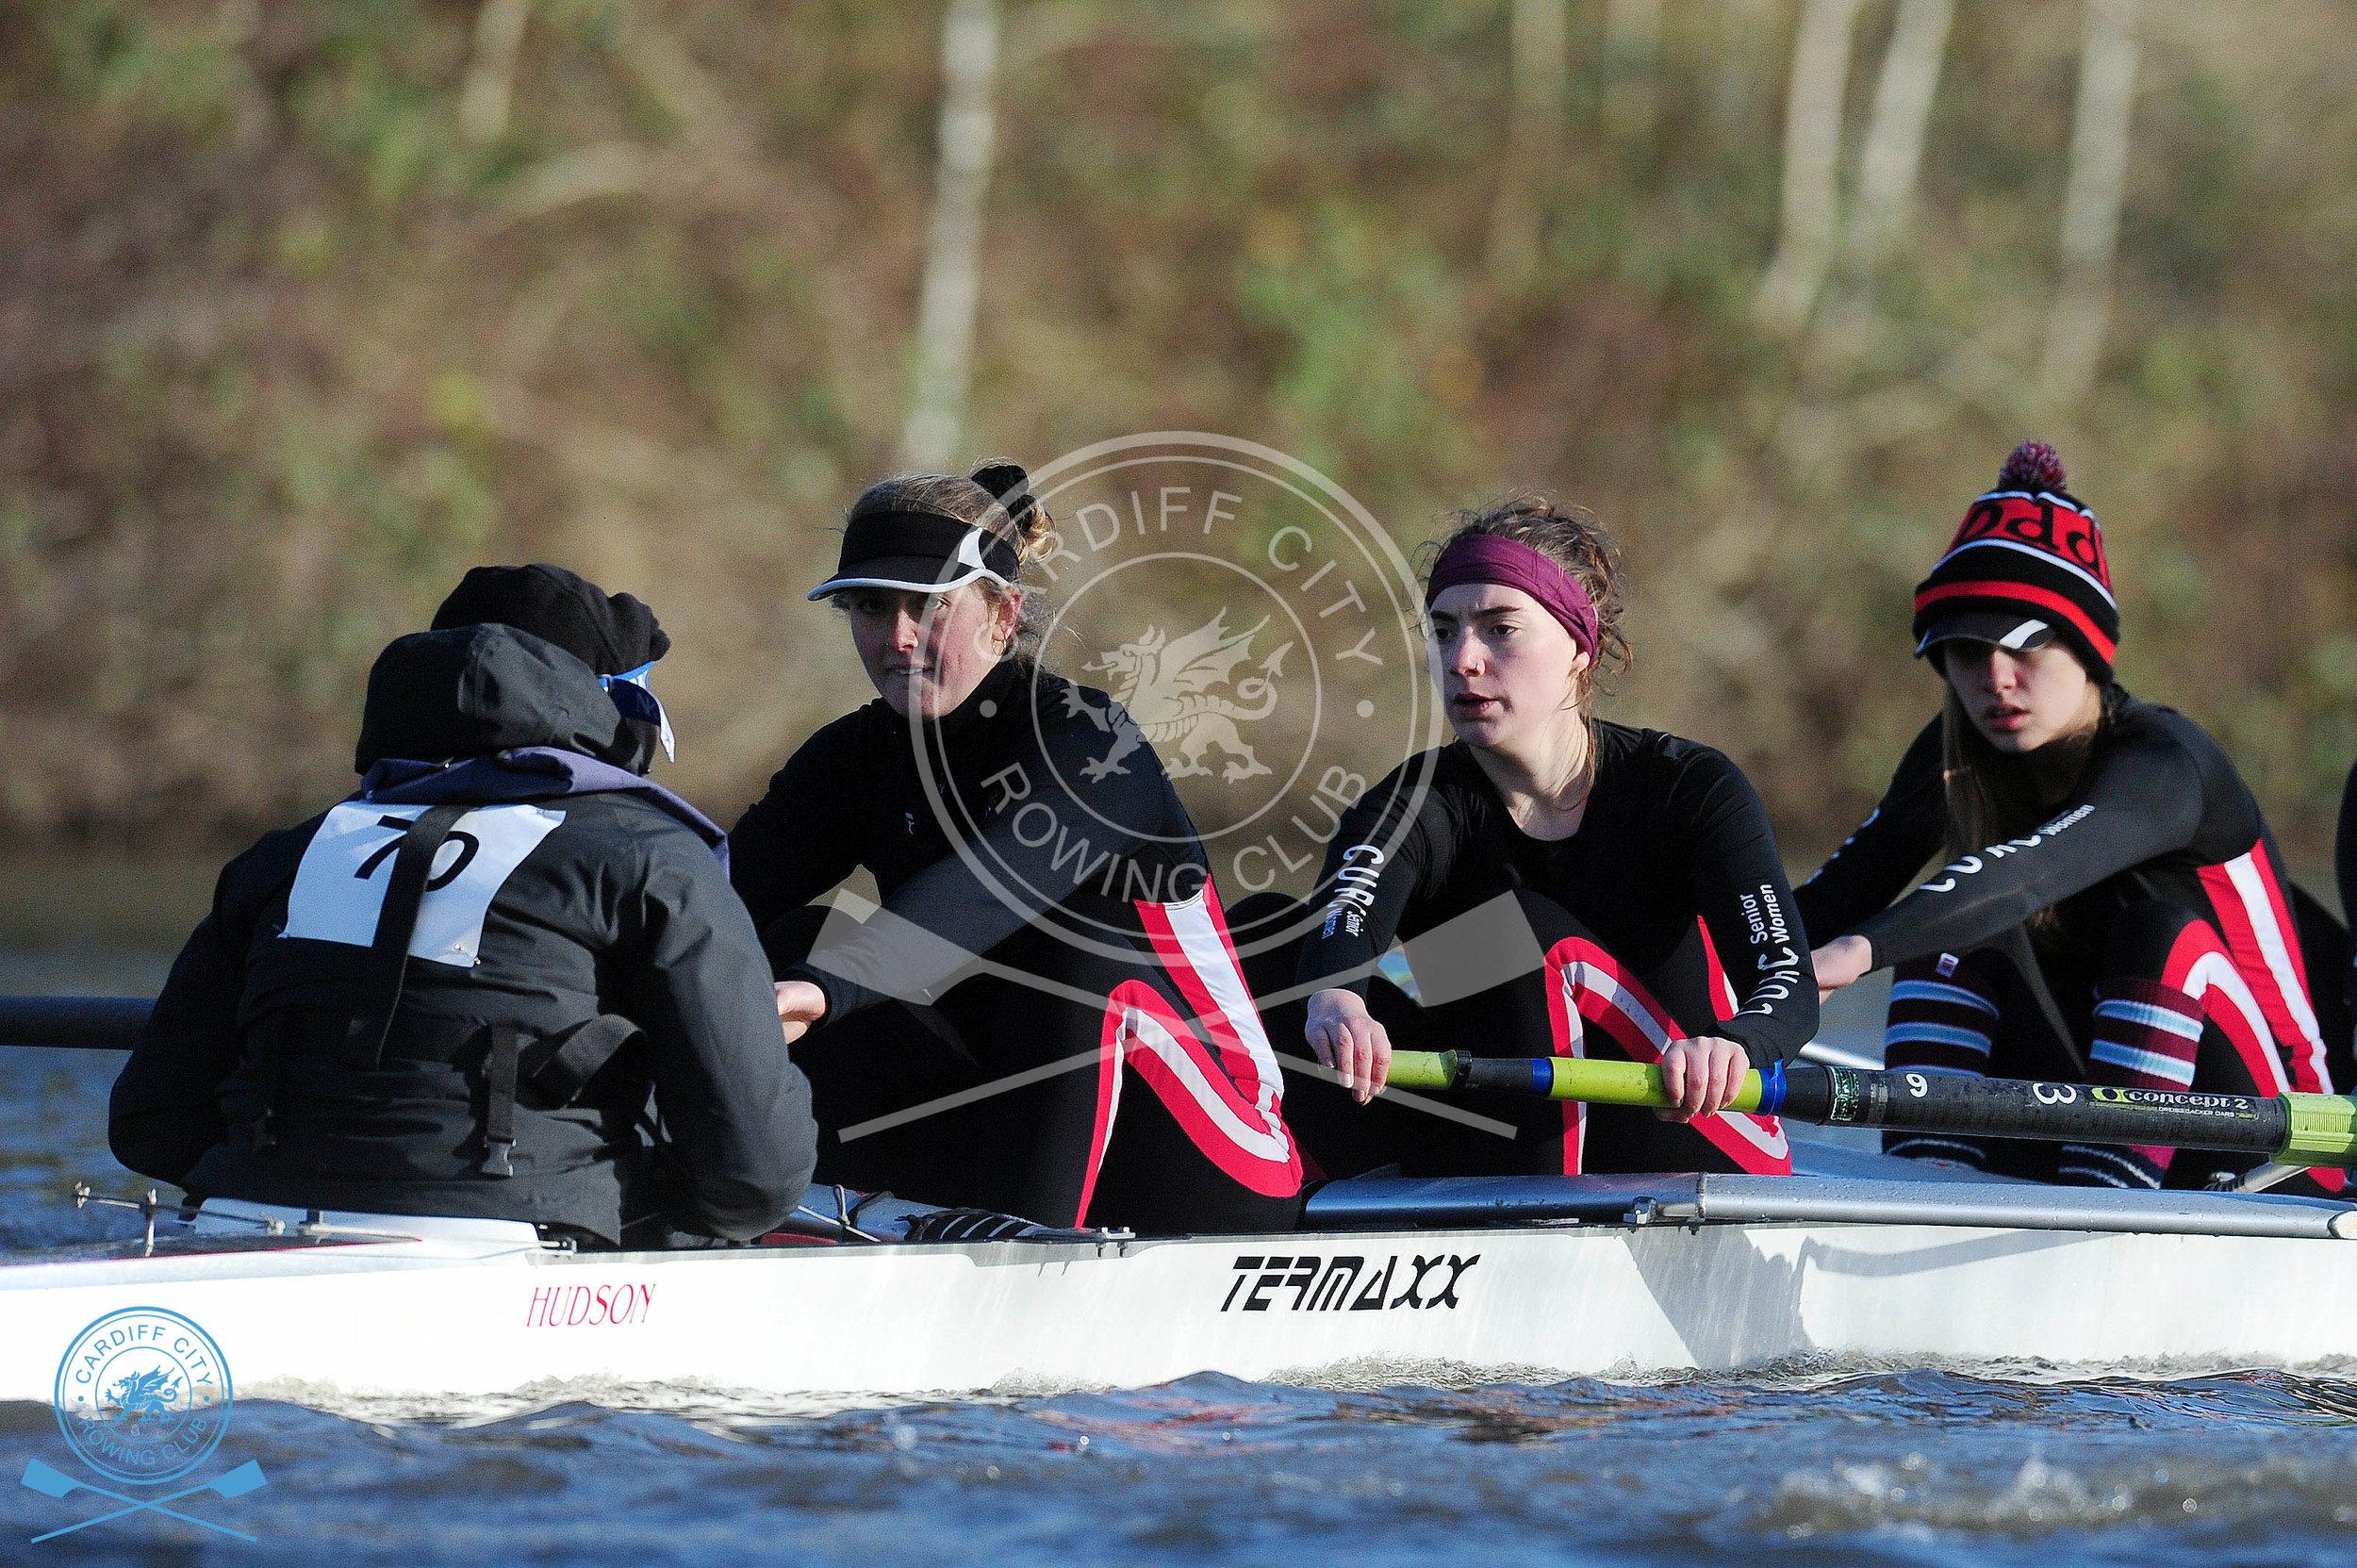 DW_280119_Cardiff_City_Rowing_241.jpg